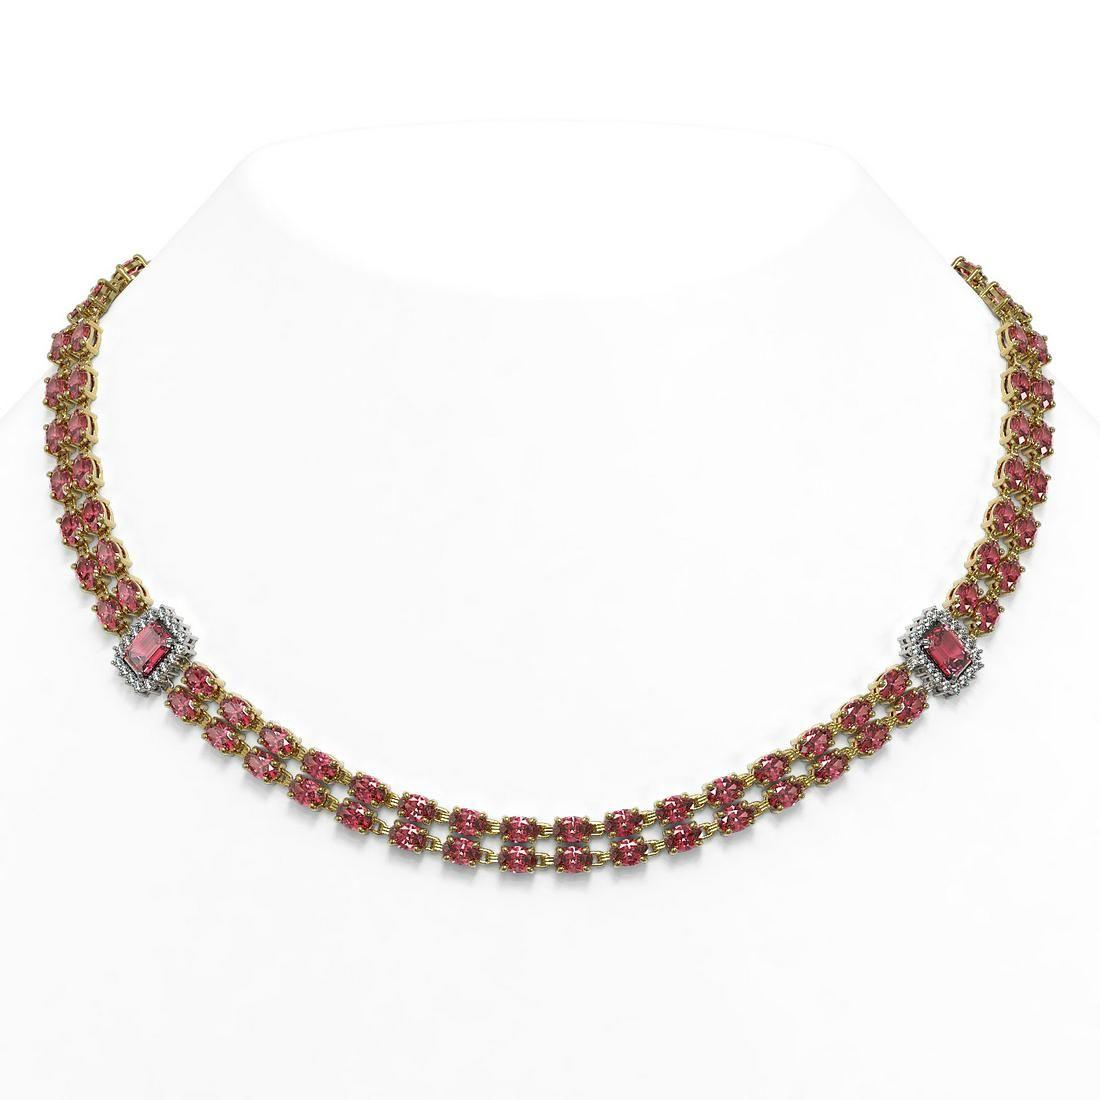 37.23 ctw Tourmaline & Diamond Necklace 14K Yellow Gold